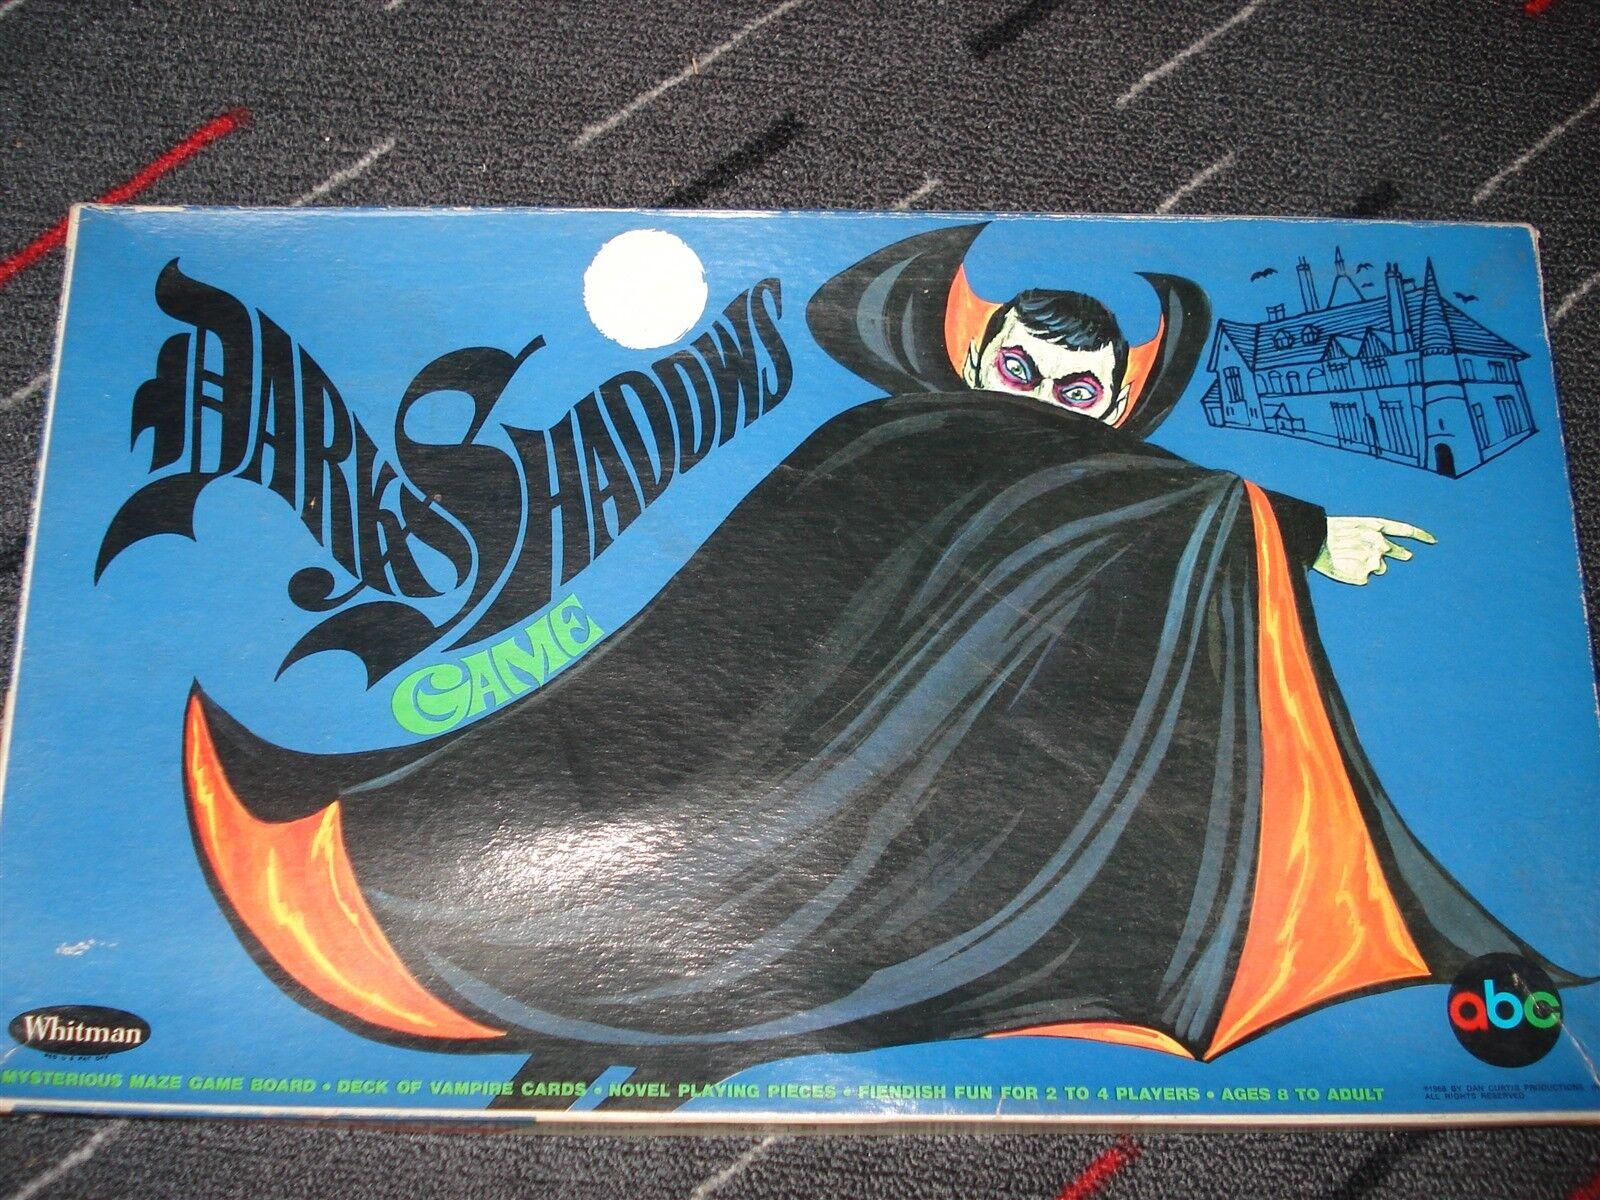 DARK SHADOWS GAME - WHITMAN - 1968 - 100% - - - DARK SHADOWS - MYSTERIOUS MAZE GAME 260951